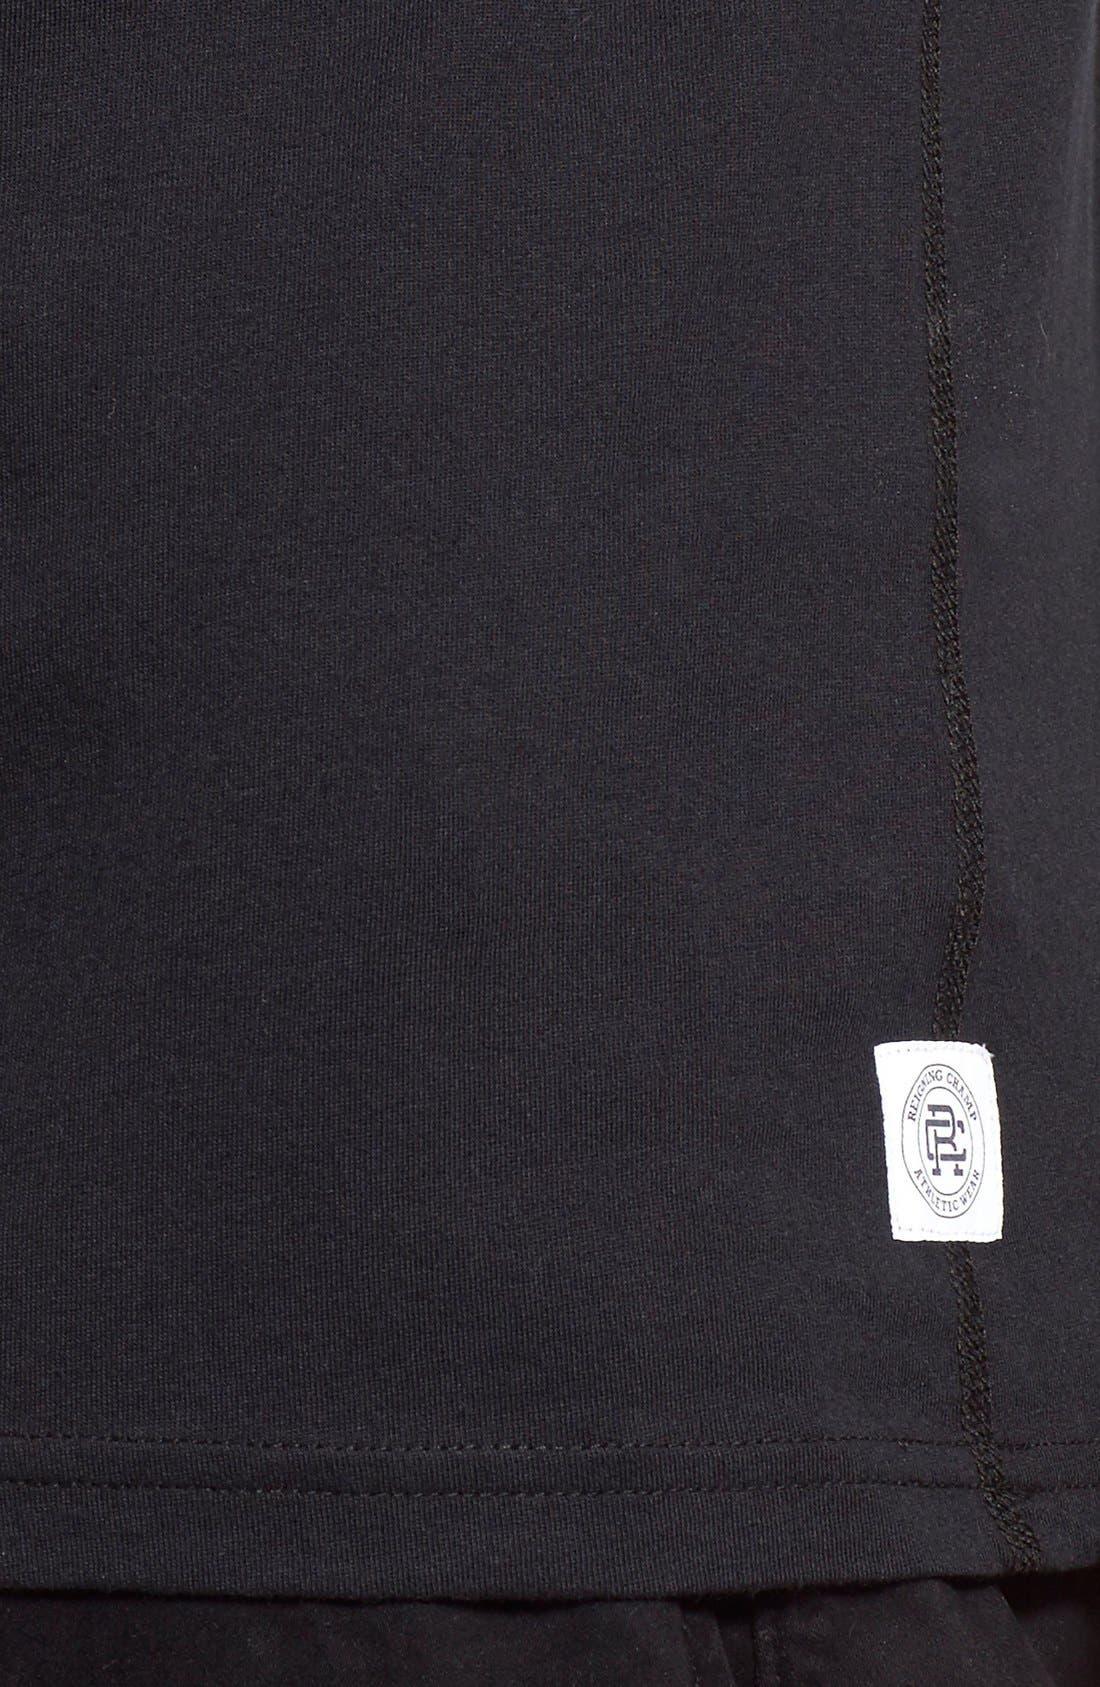 Short Sleeve Crewneck T-Shirt,                             Alternate thumbnail 4, color,                             BLACK